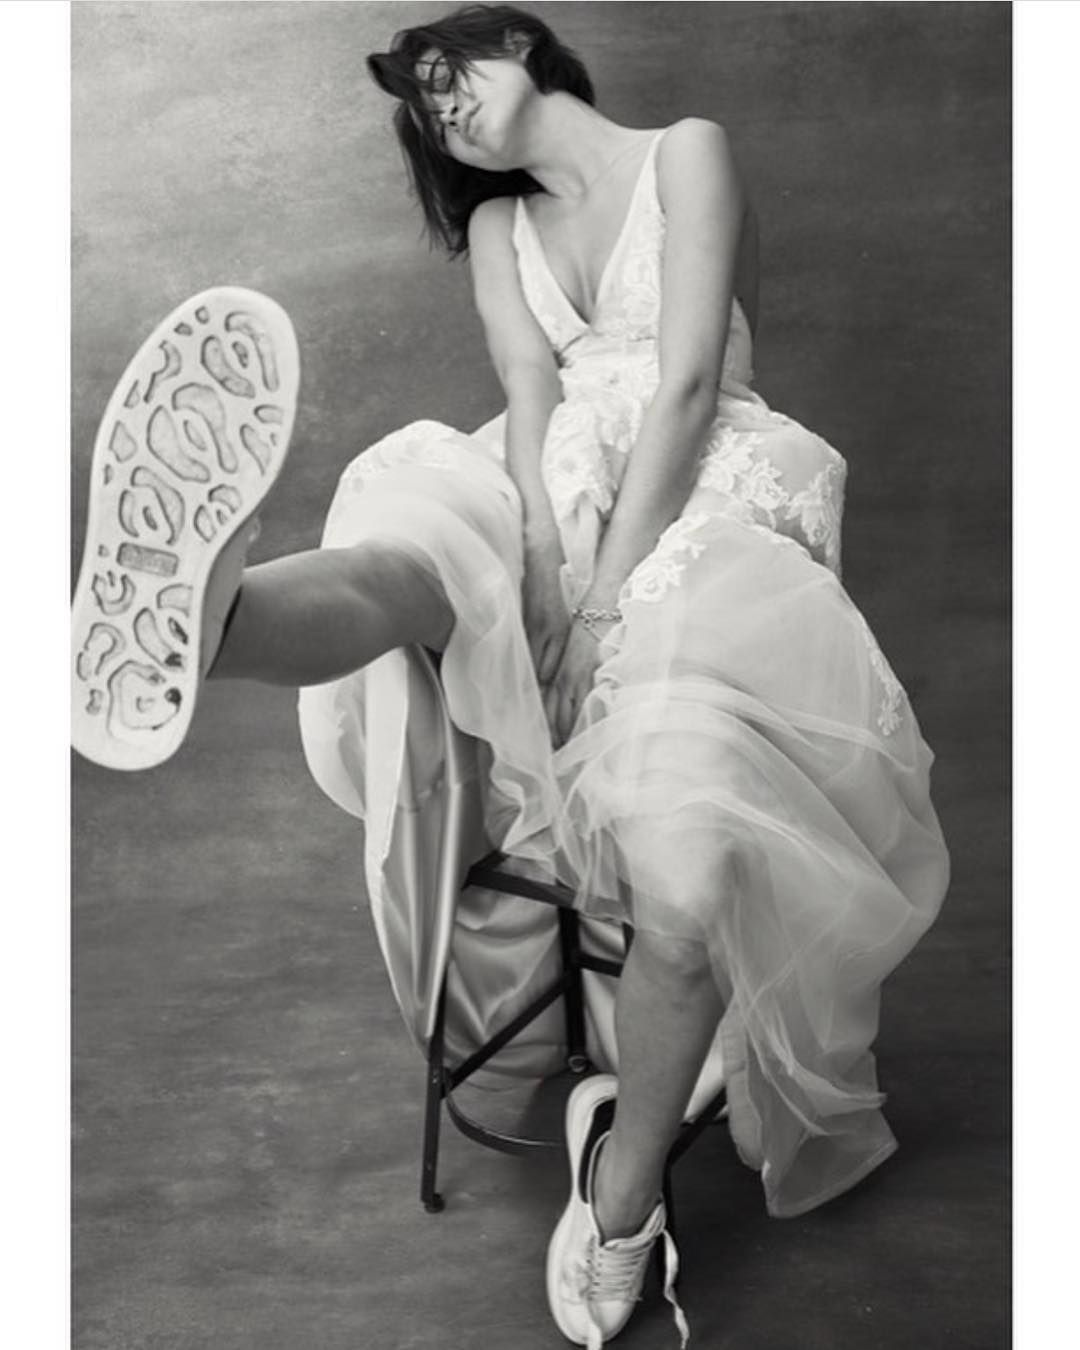 Newyork fasion model britishshorthair weddingdress mcqueen